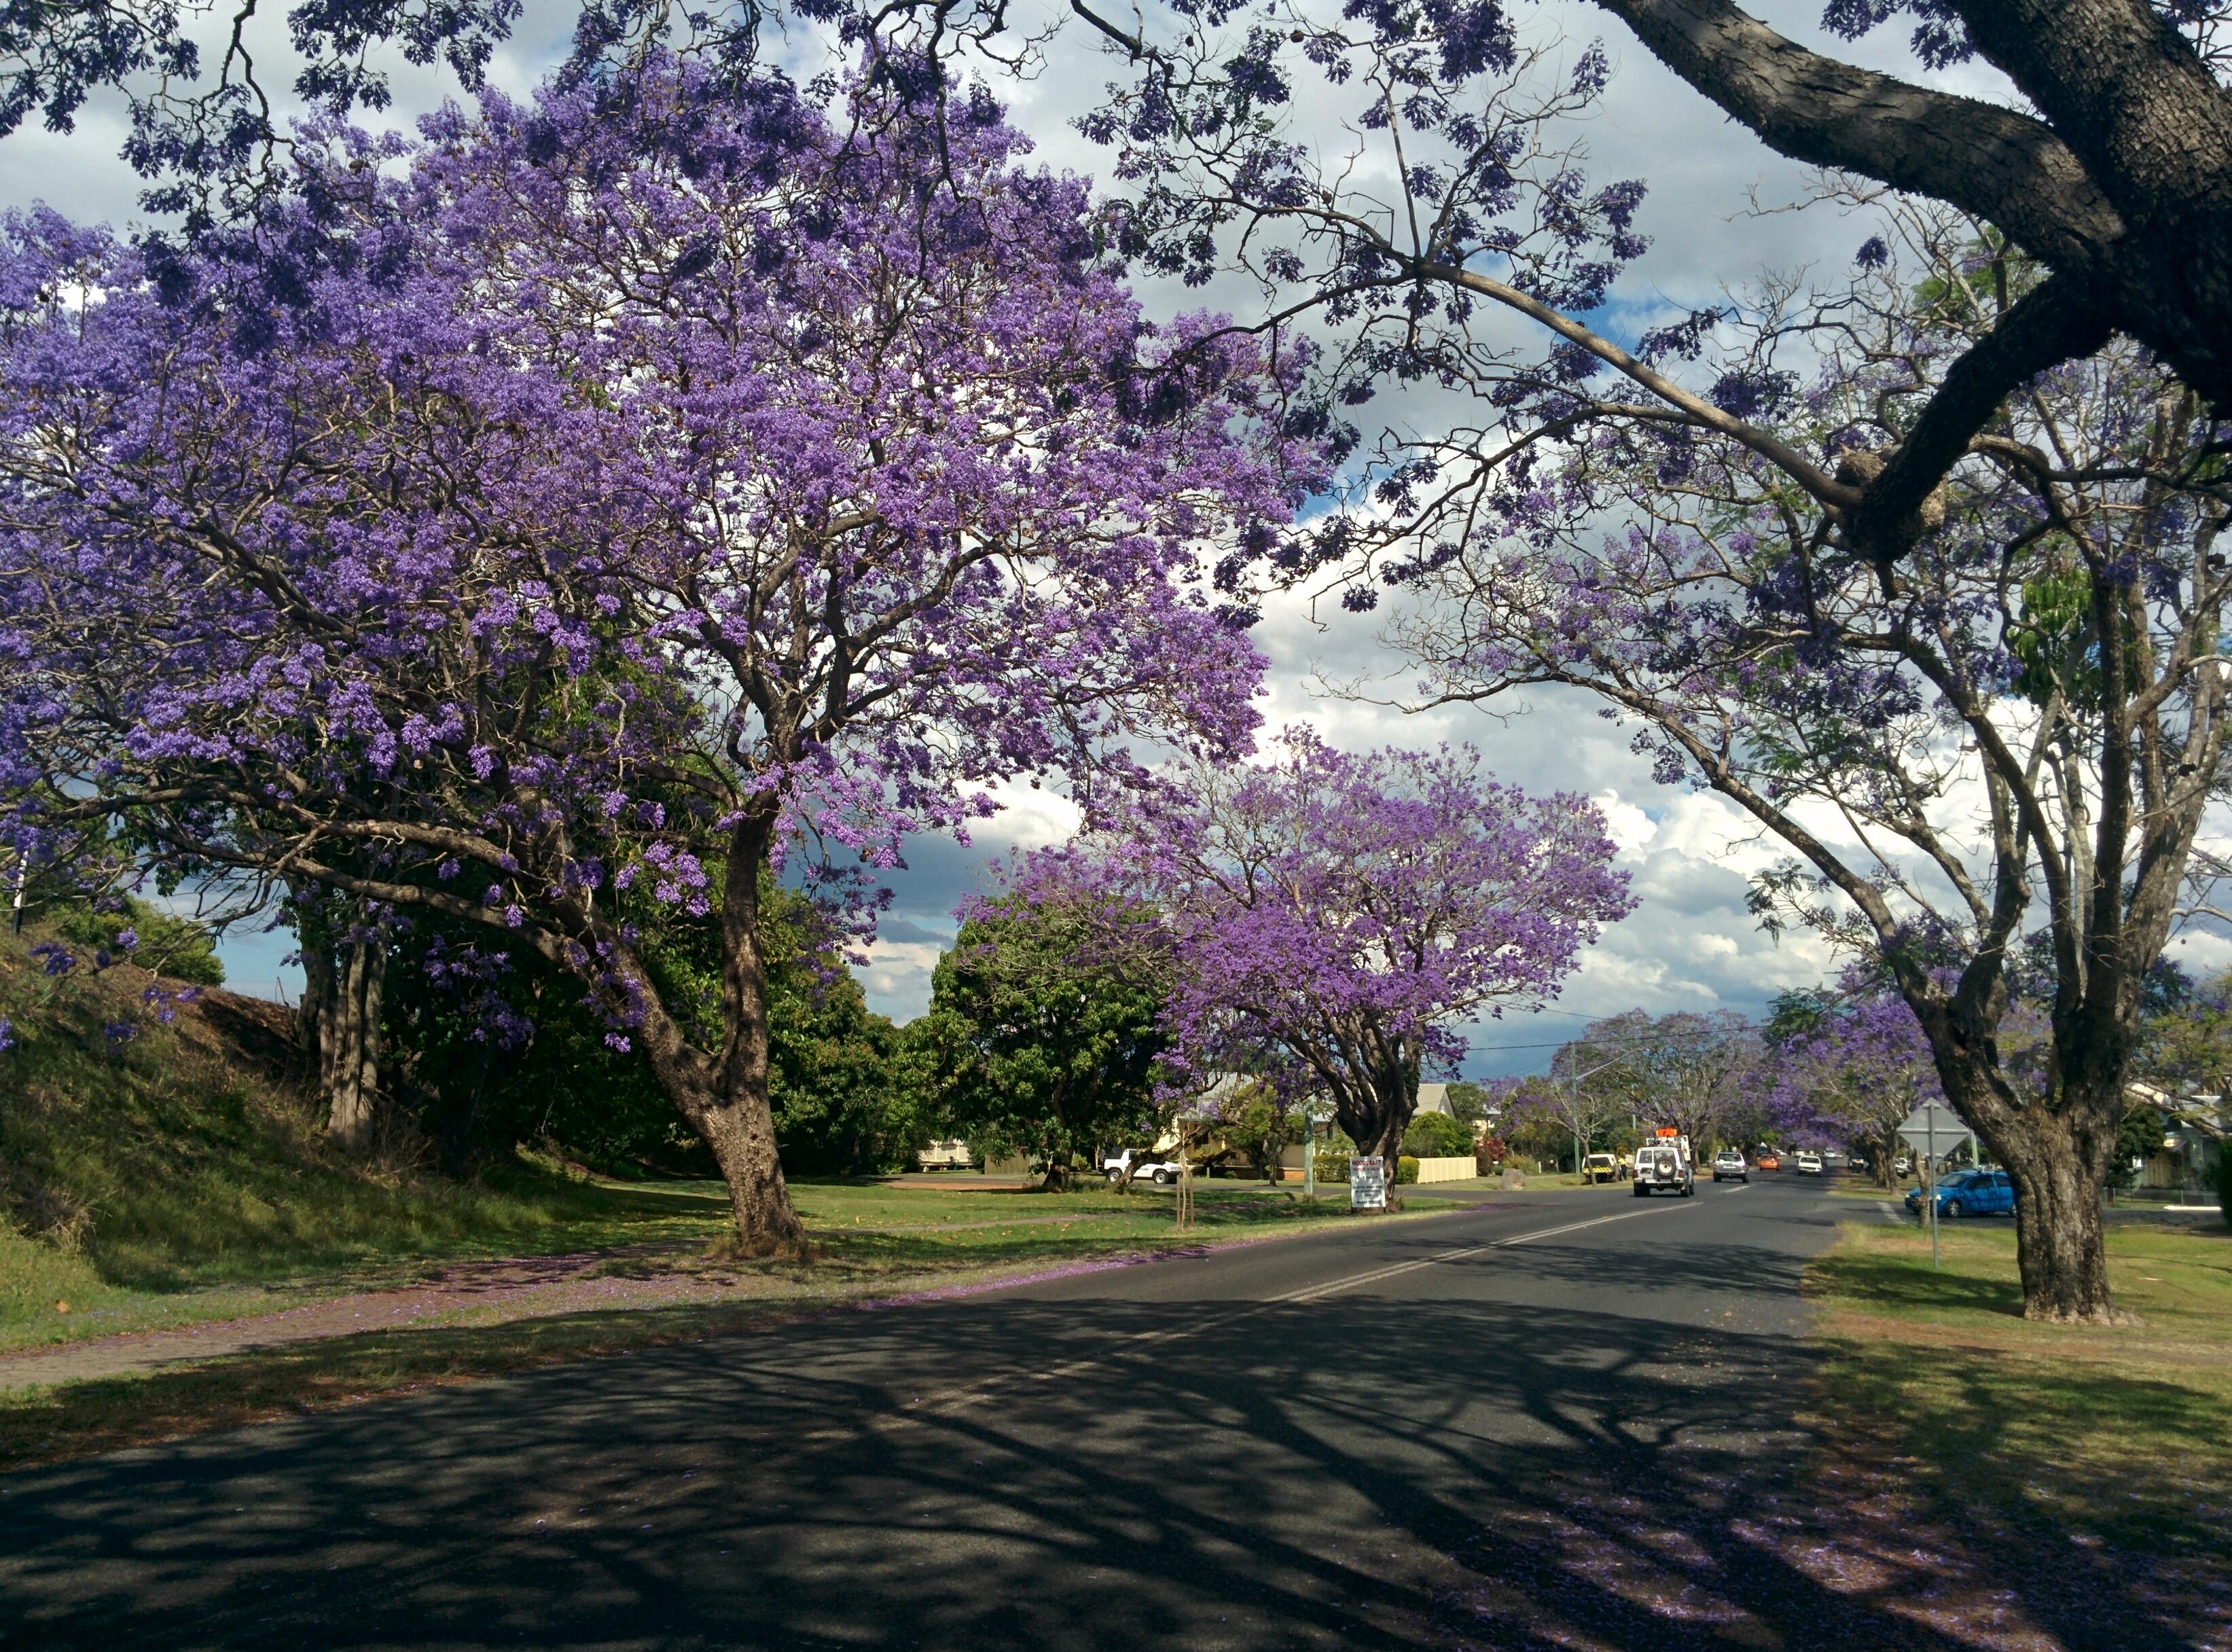 De Jacaranda bomen